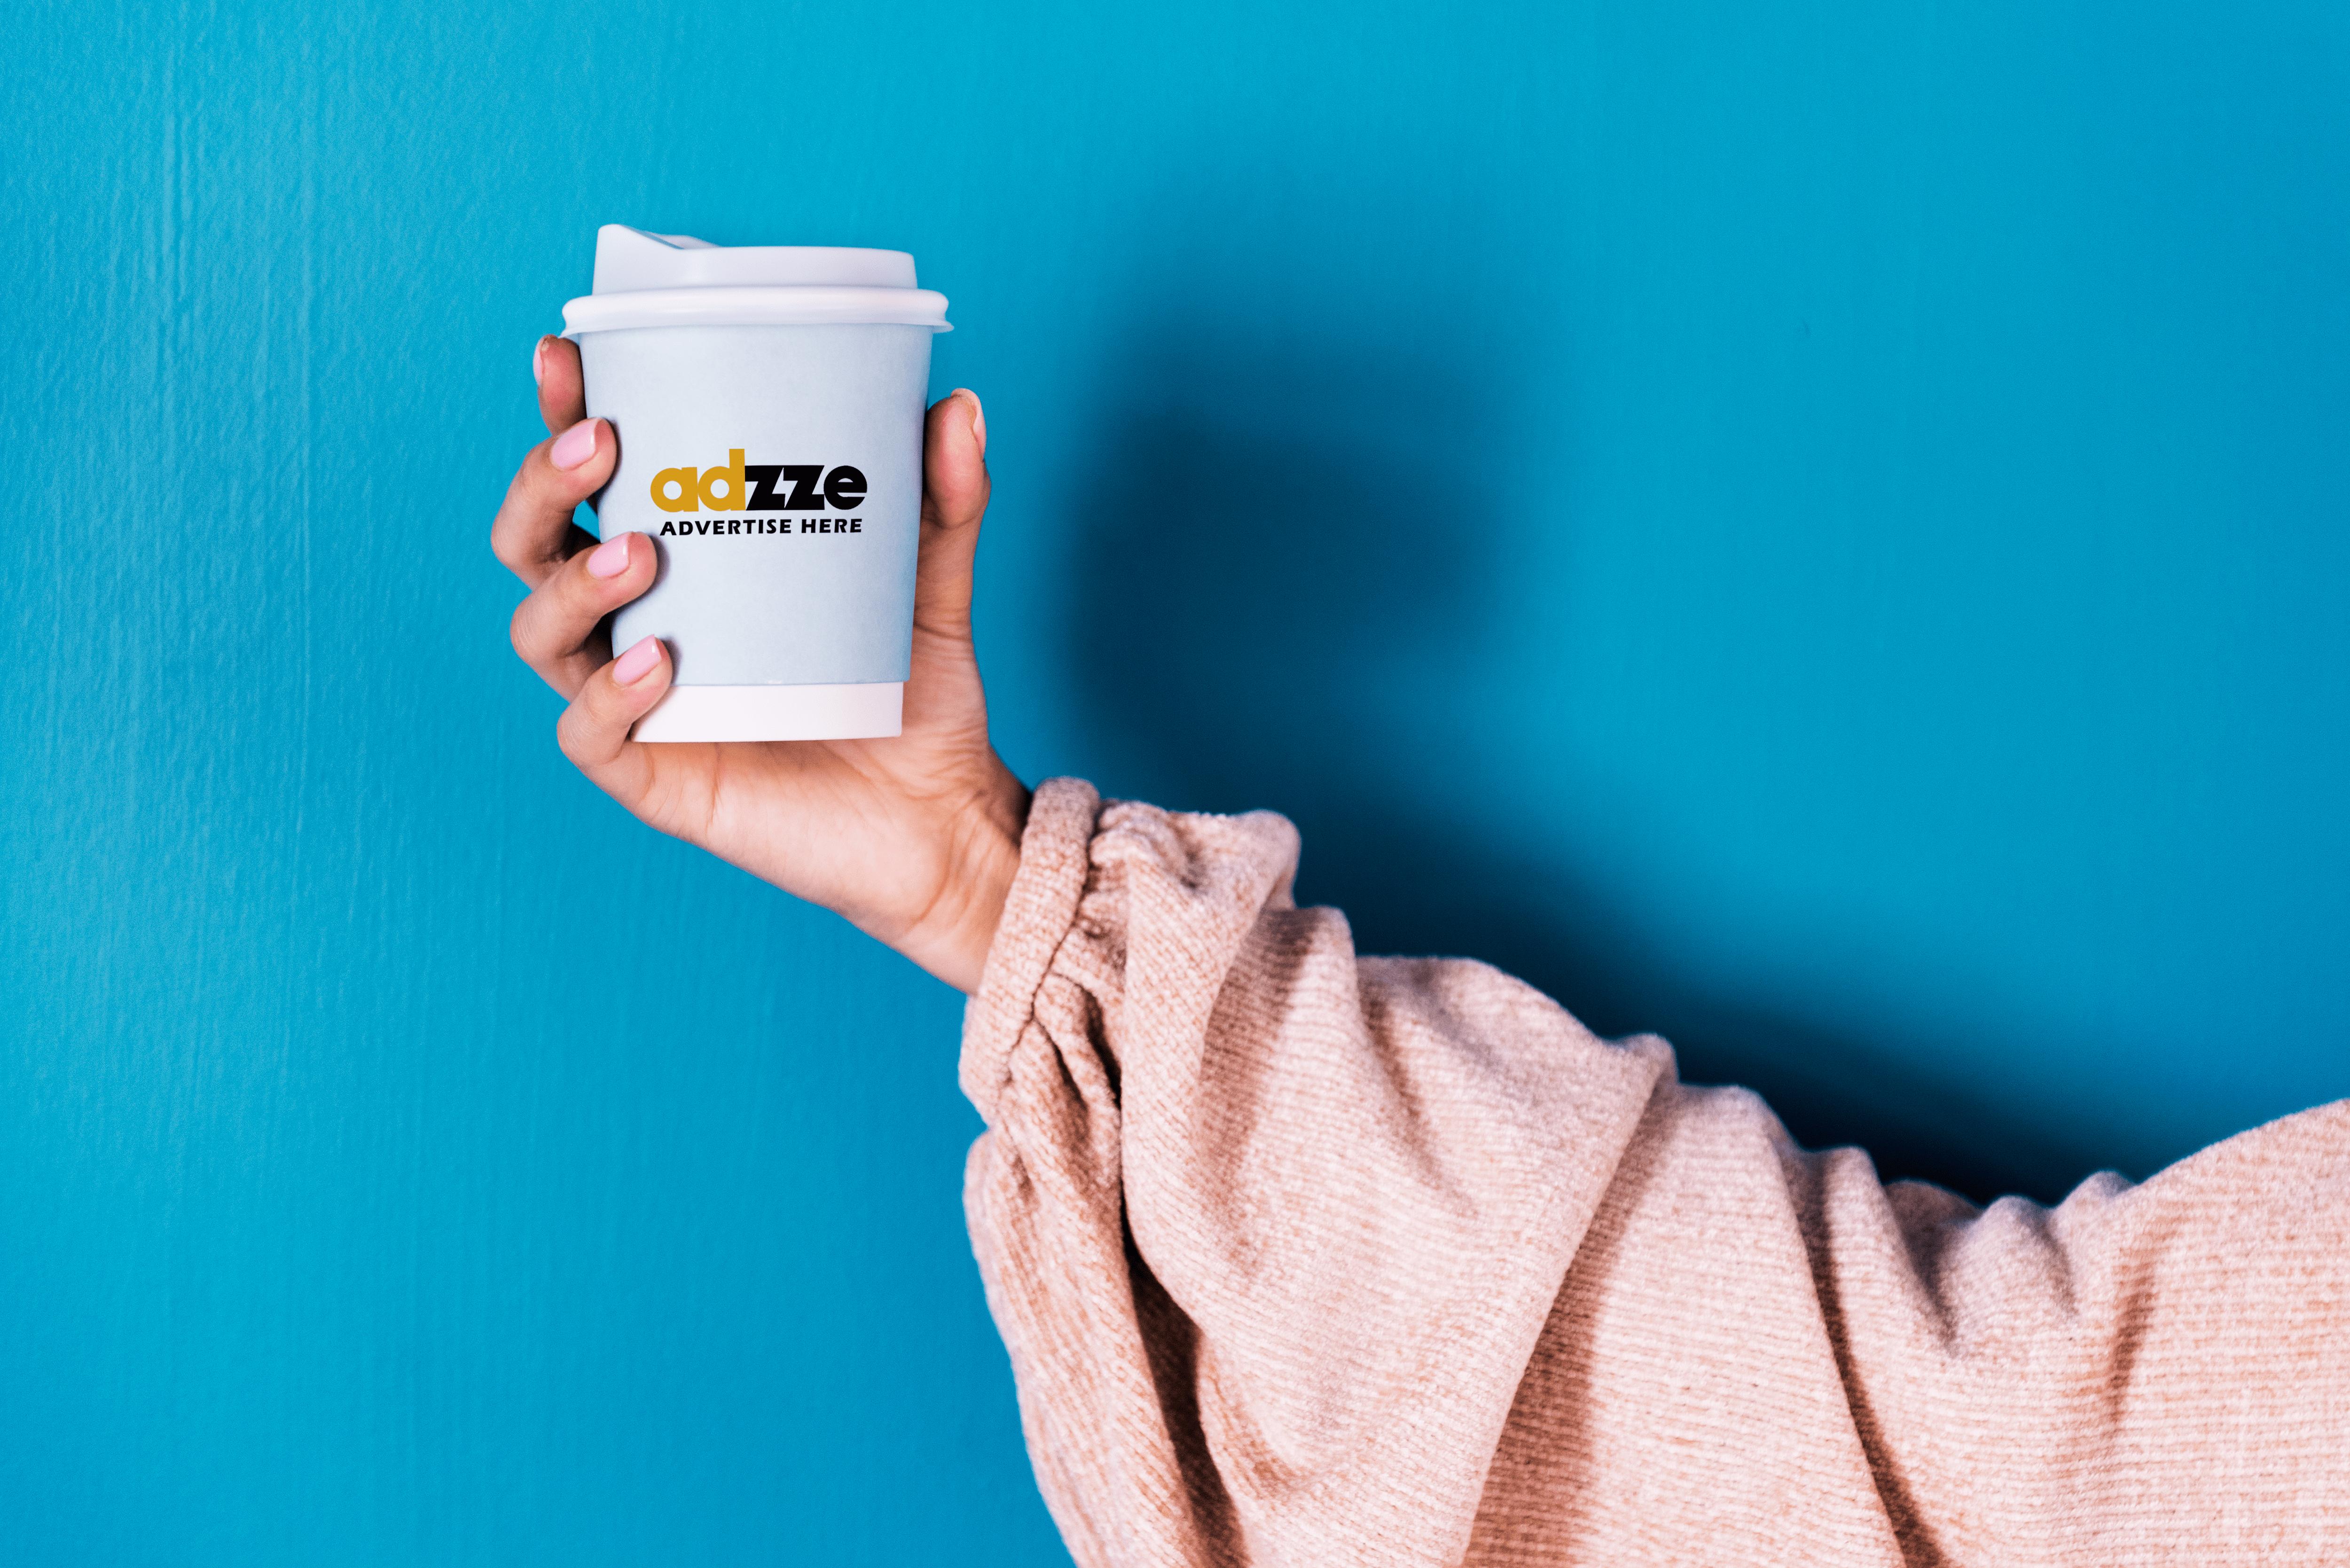 Coffee sleeve_in-Hand